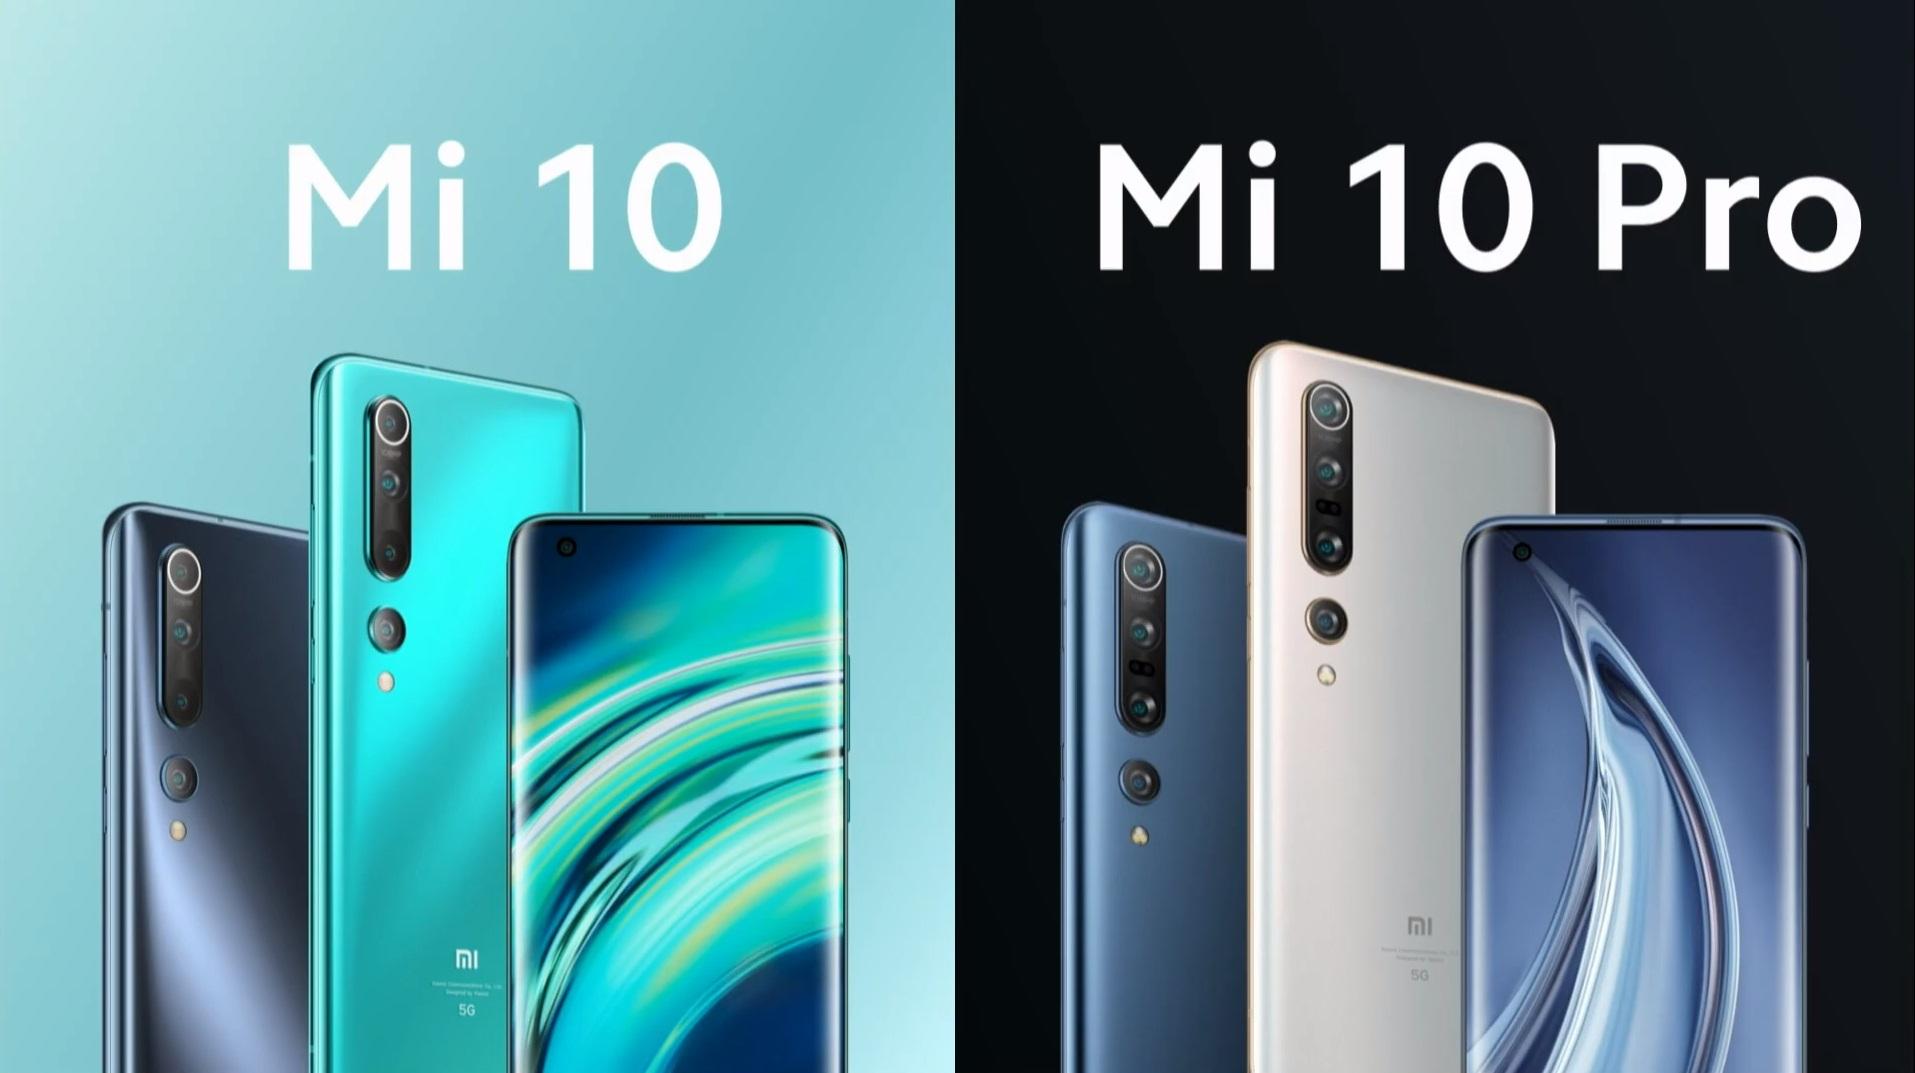 Xiaomi Mi 10 (Pro) smartphone